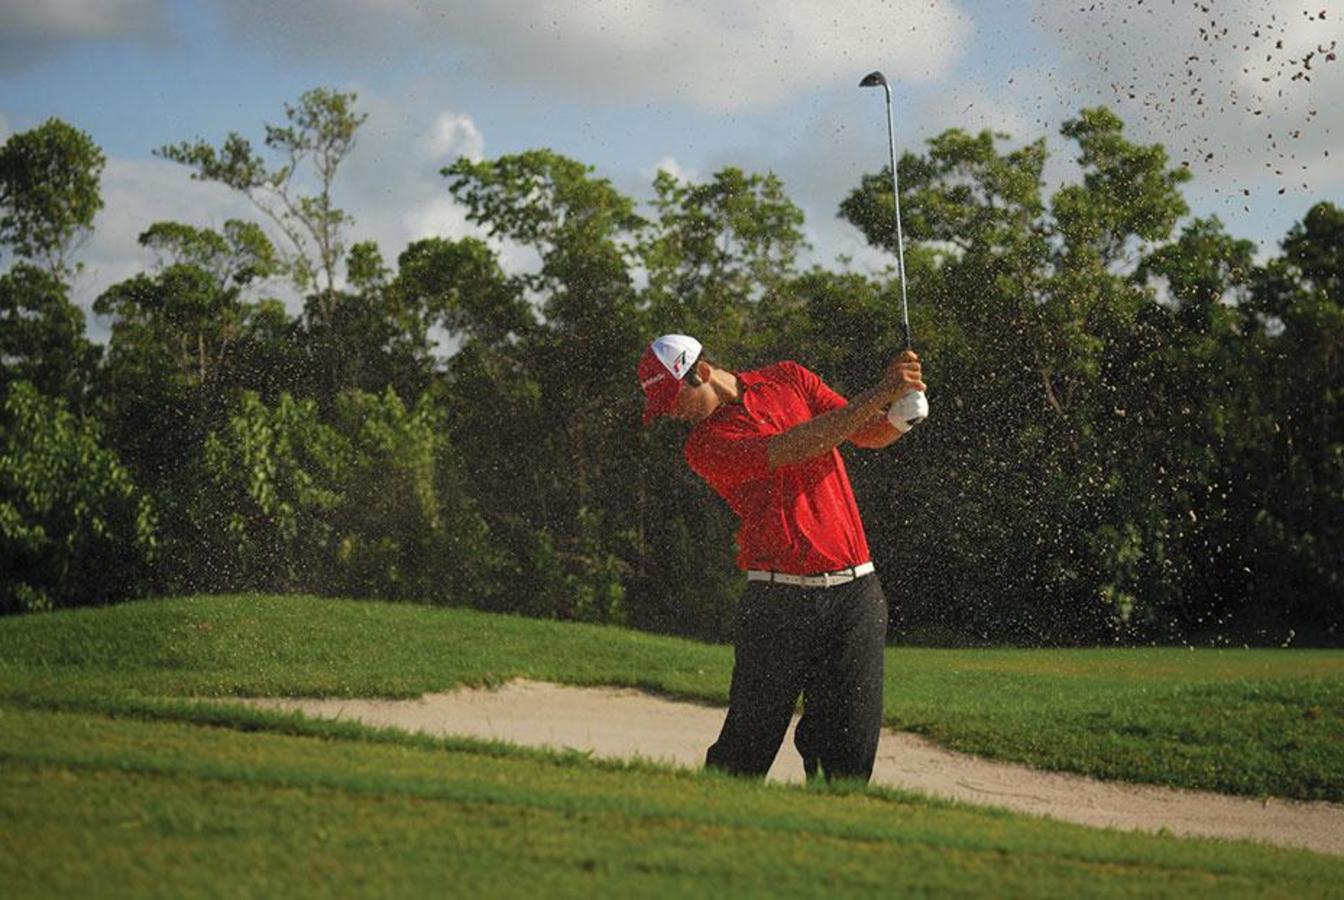 Golfer at Crandon Golf at Key Biscayne